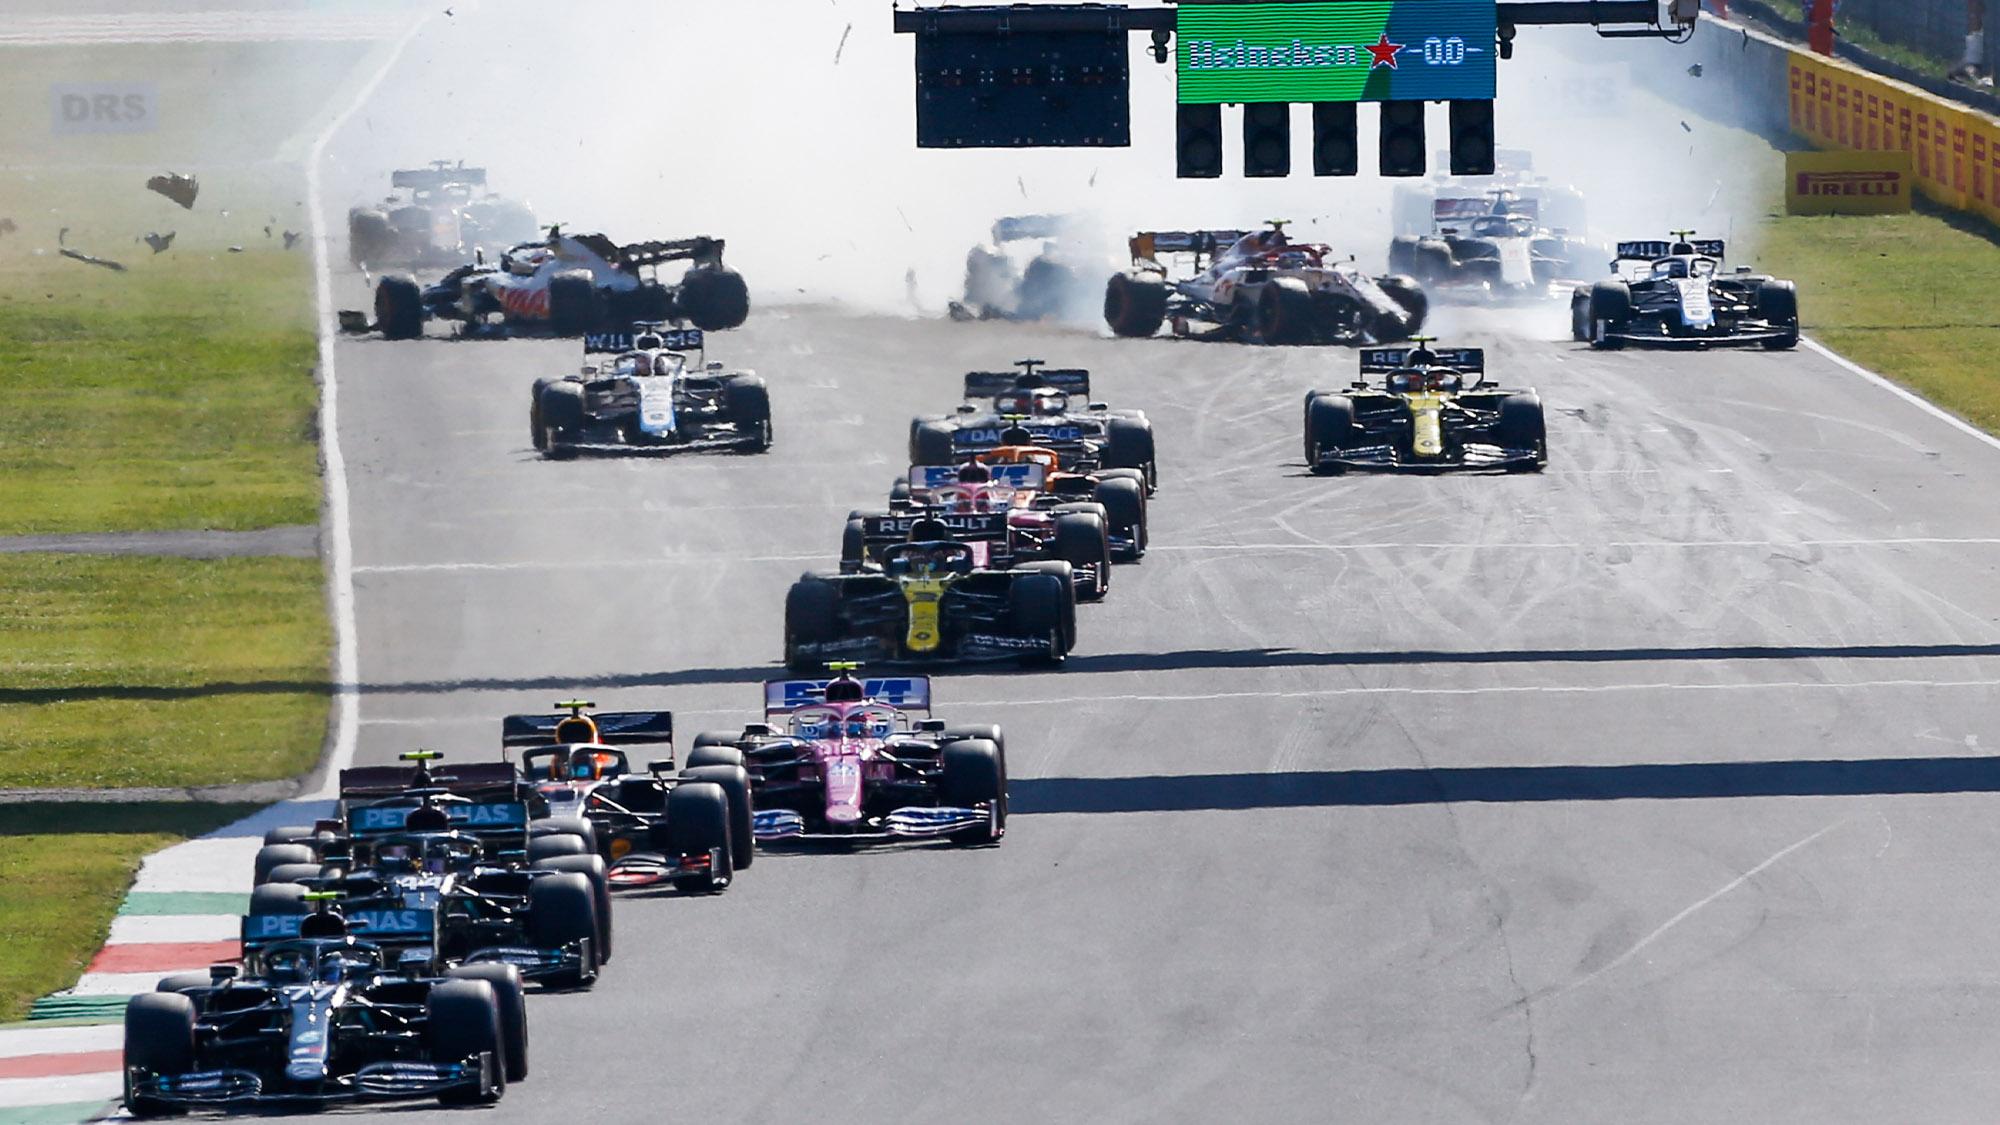 Valtteri Bottas leads the 2020 F1 Tuscan Grand Prix at Mugello at the safety car restart as Kevin Magnussen, Antonio Giovinazzi and Carlos Sainz crash behind him